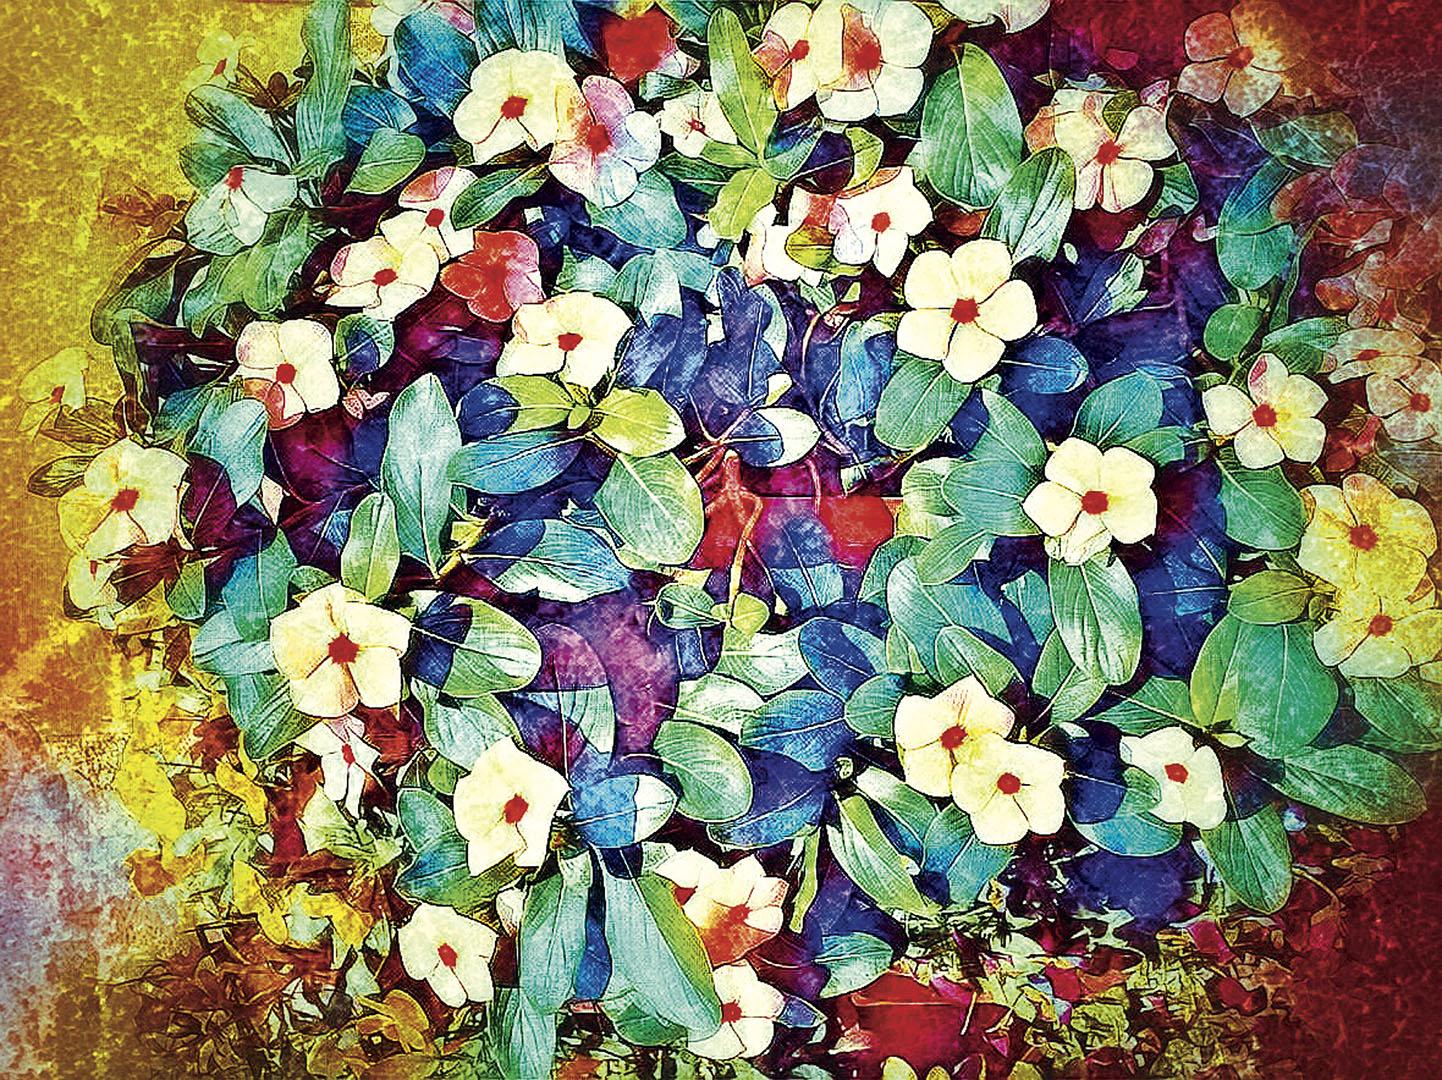 Flowers_013_I19.25.58